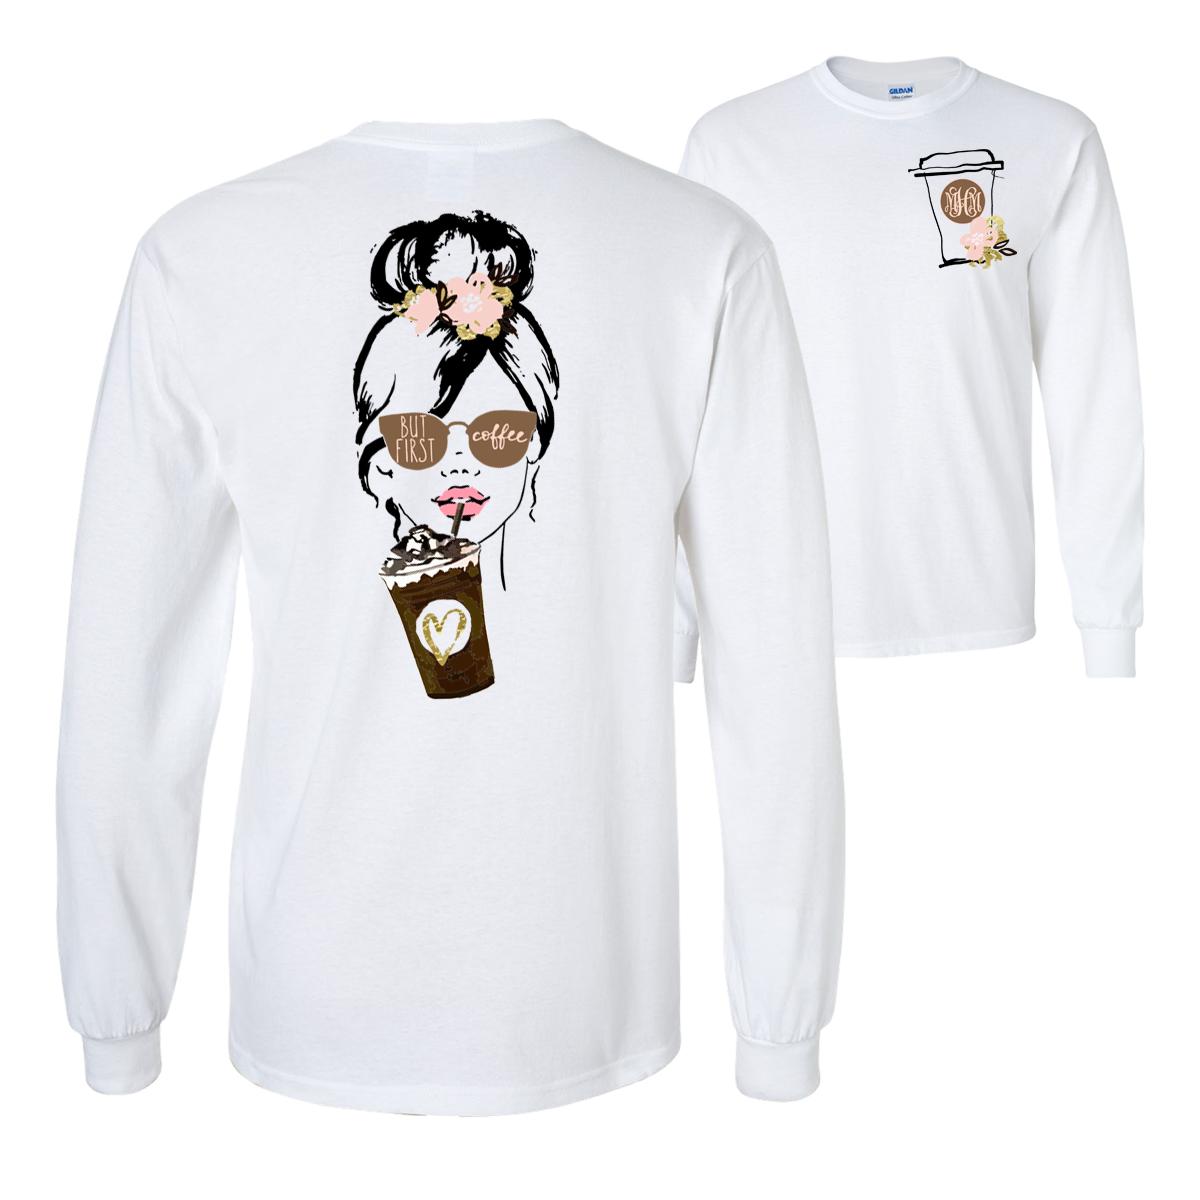 c514a86888bb Monogrammed Coffee Girl T-Shirt #monogram #coffee #coffeelover #coffeetime